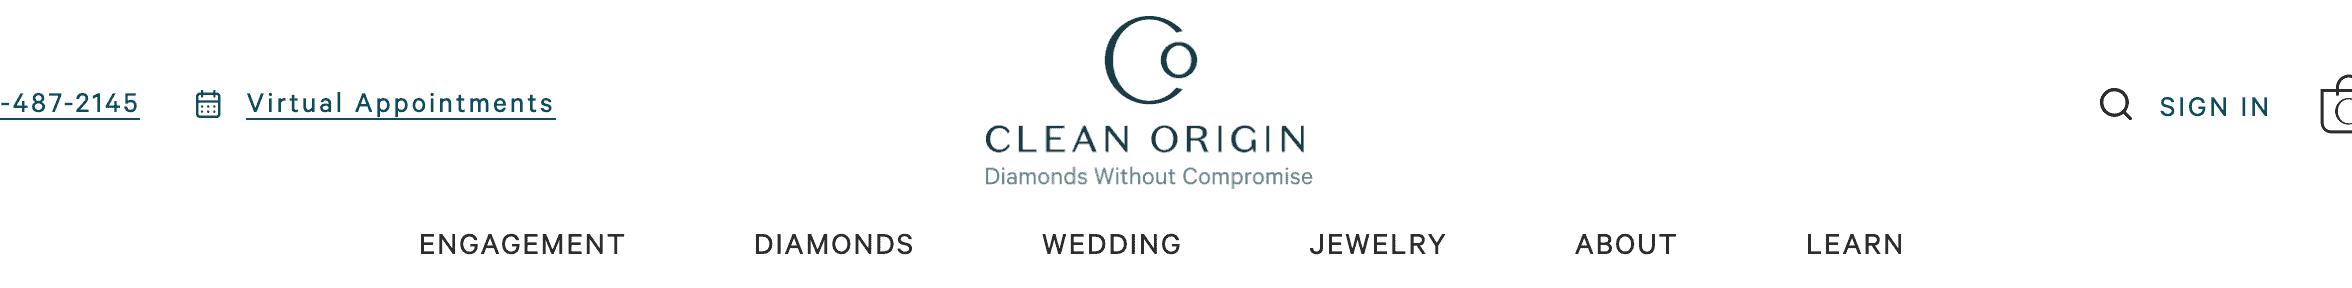 Buying blue diamonds at Clean Origin